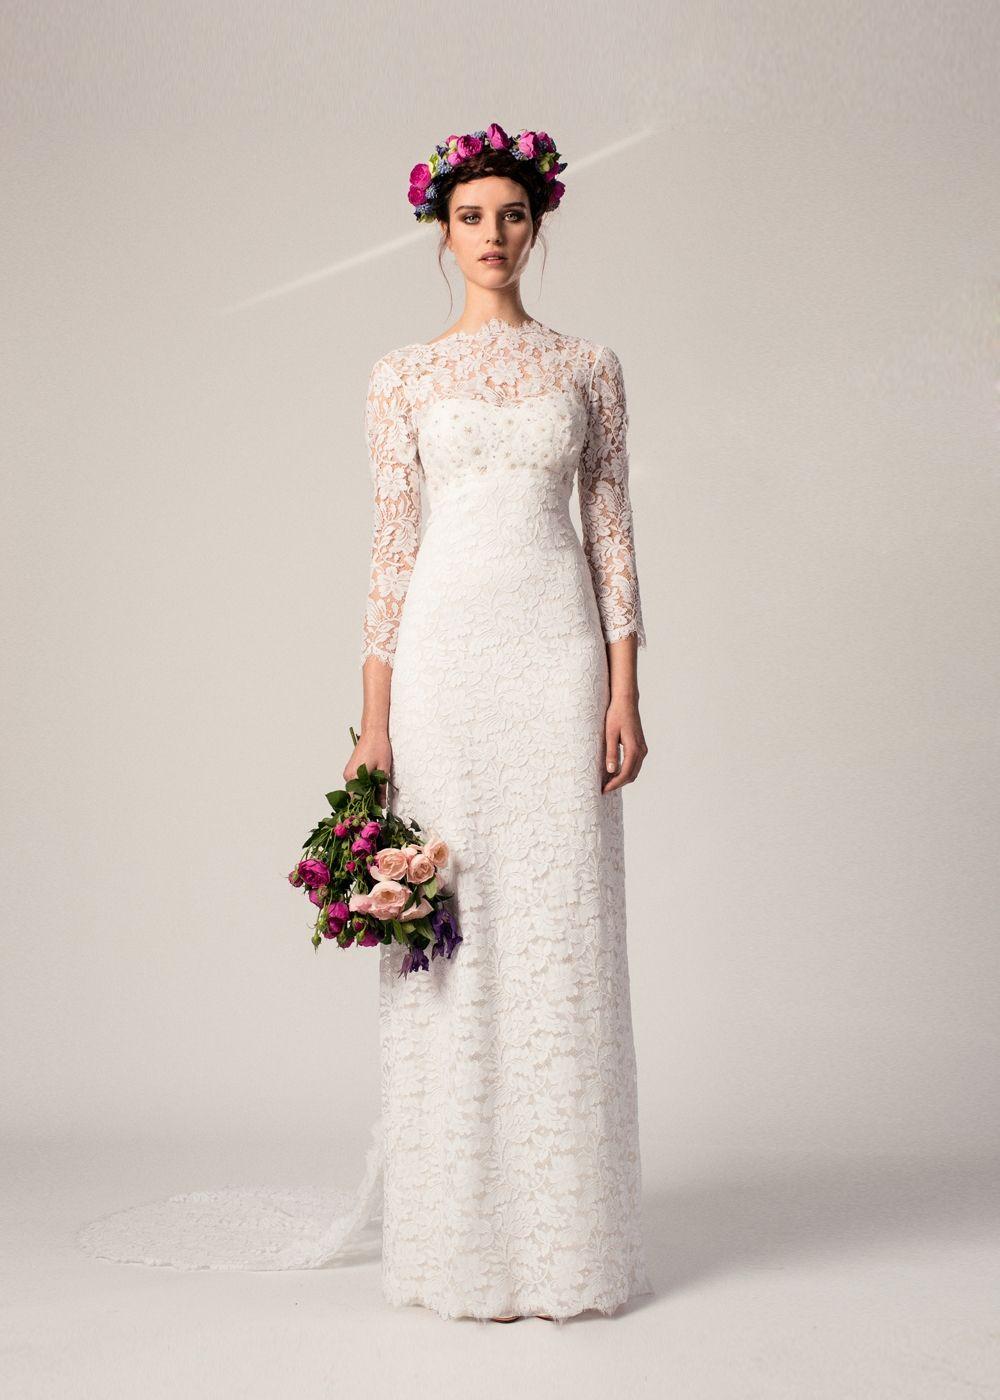 April Dress Temperley london wedding dress, Wedding